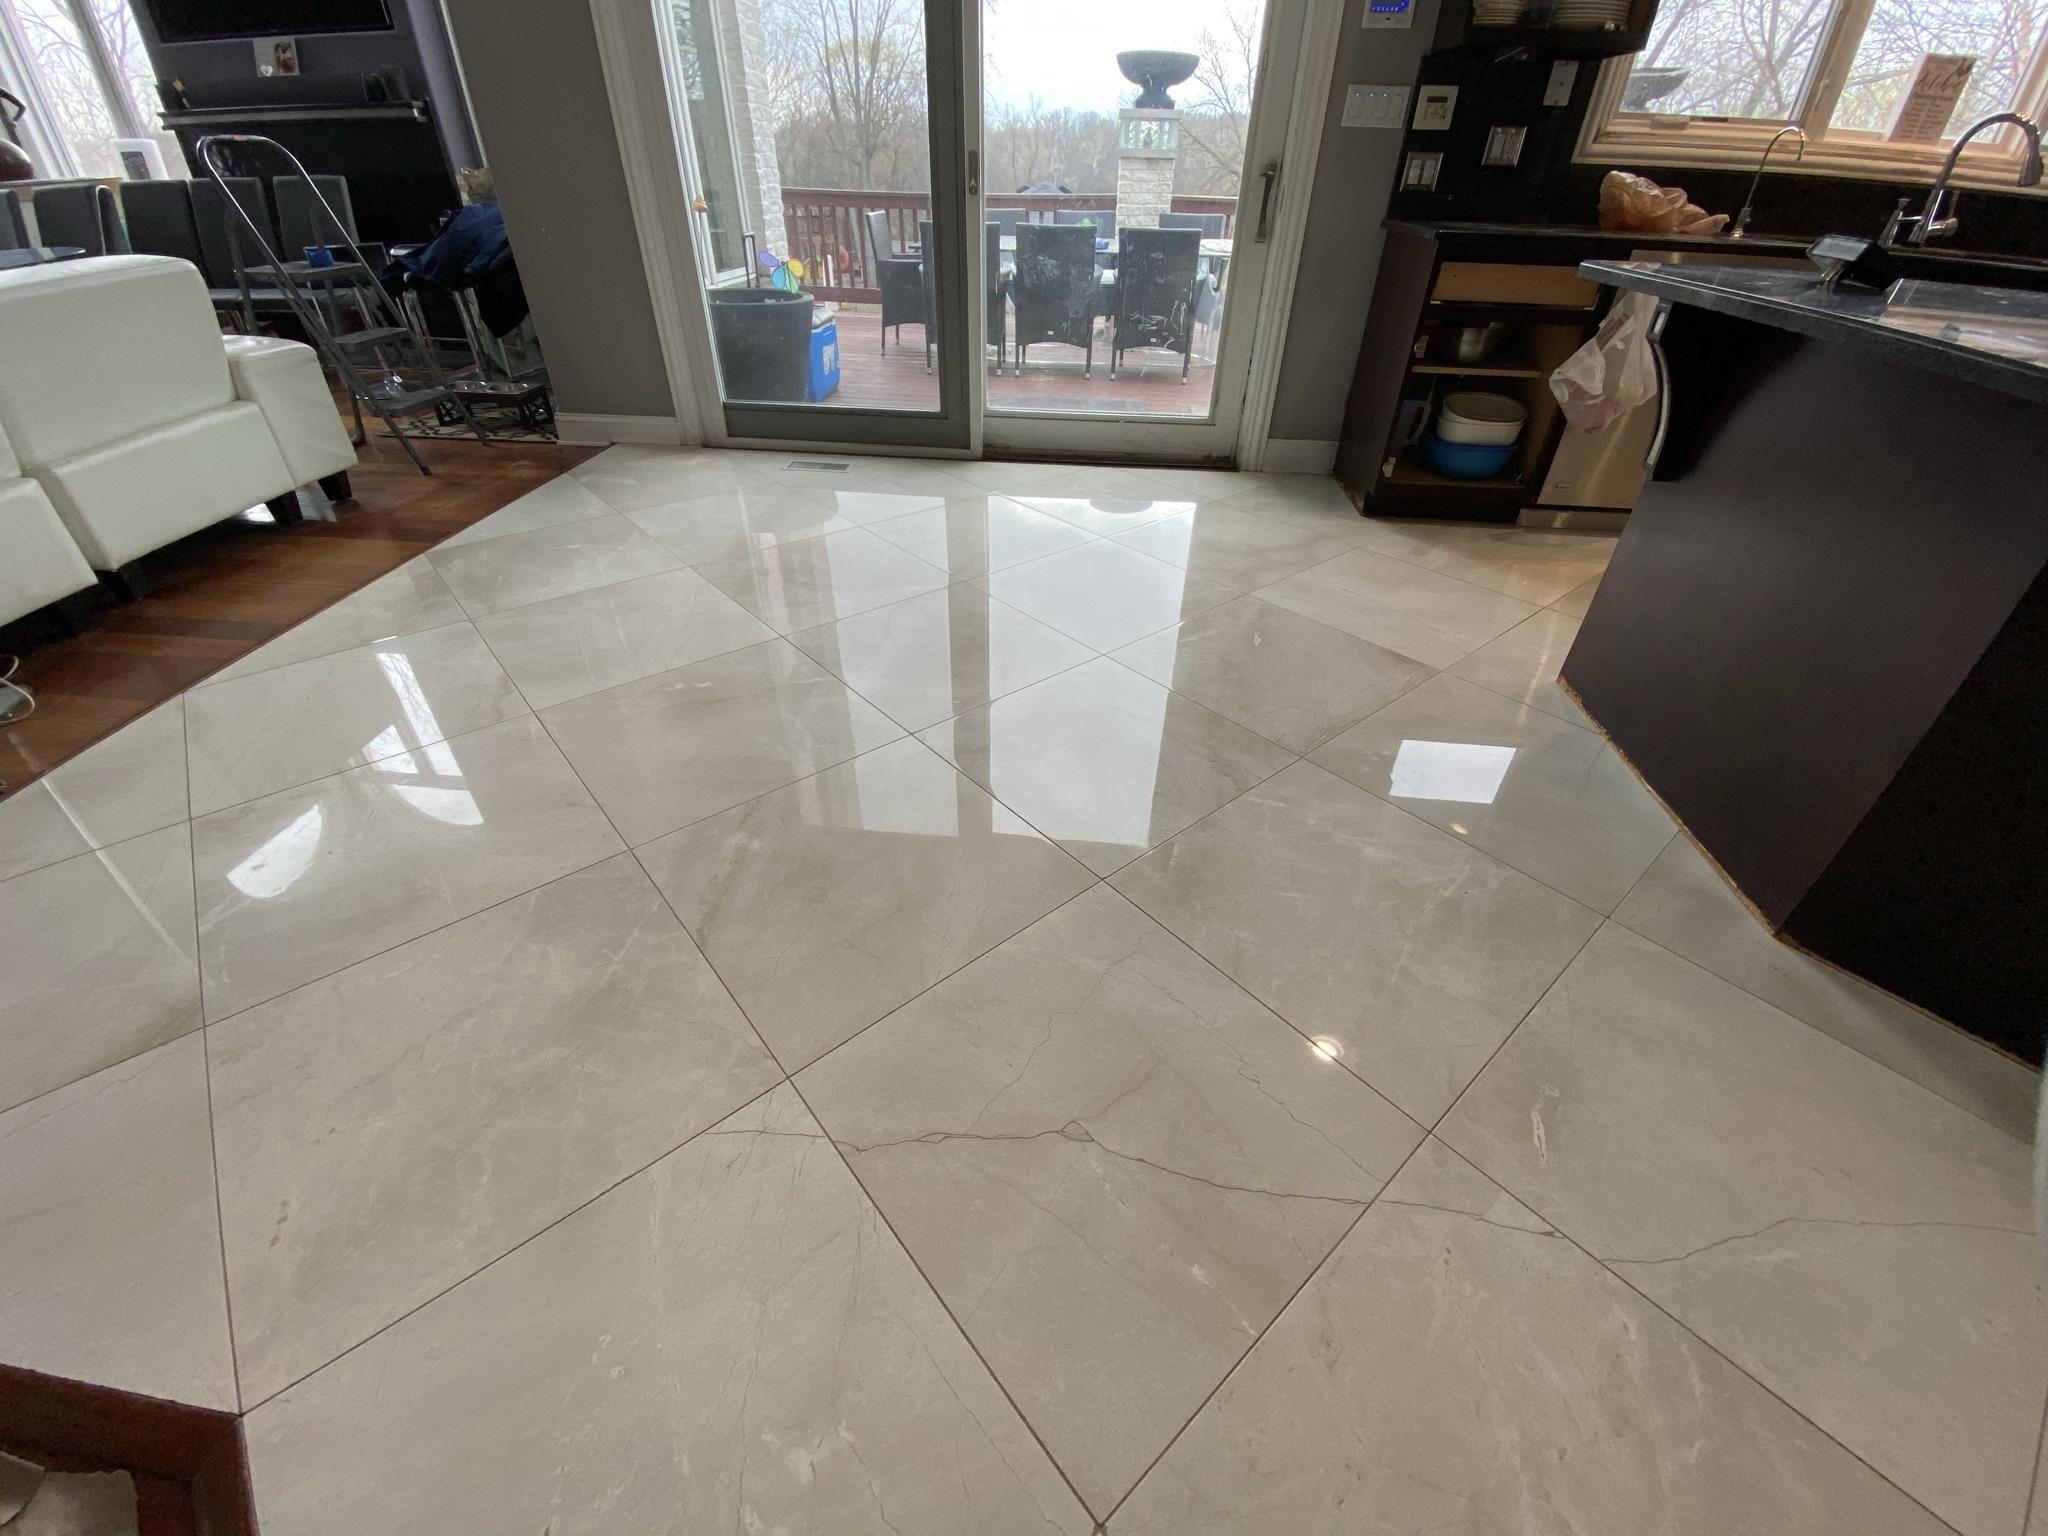 Kitchen Marble Tile Floor Restoration – marble polishing, sealing, tile crack repair